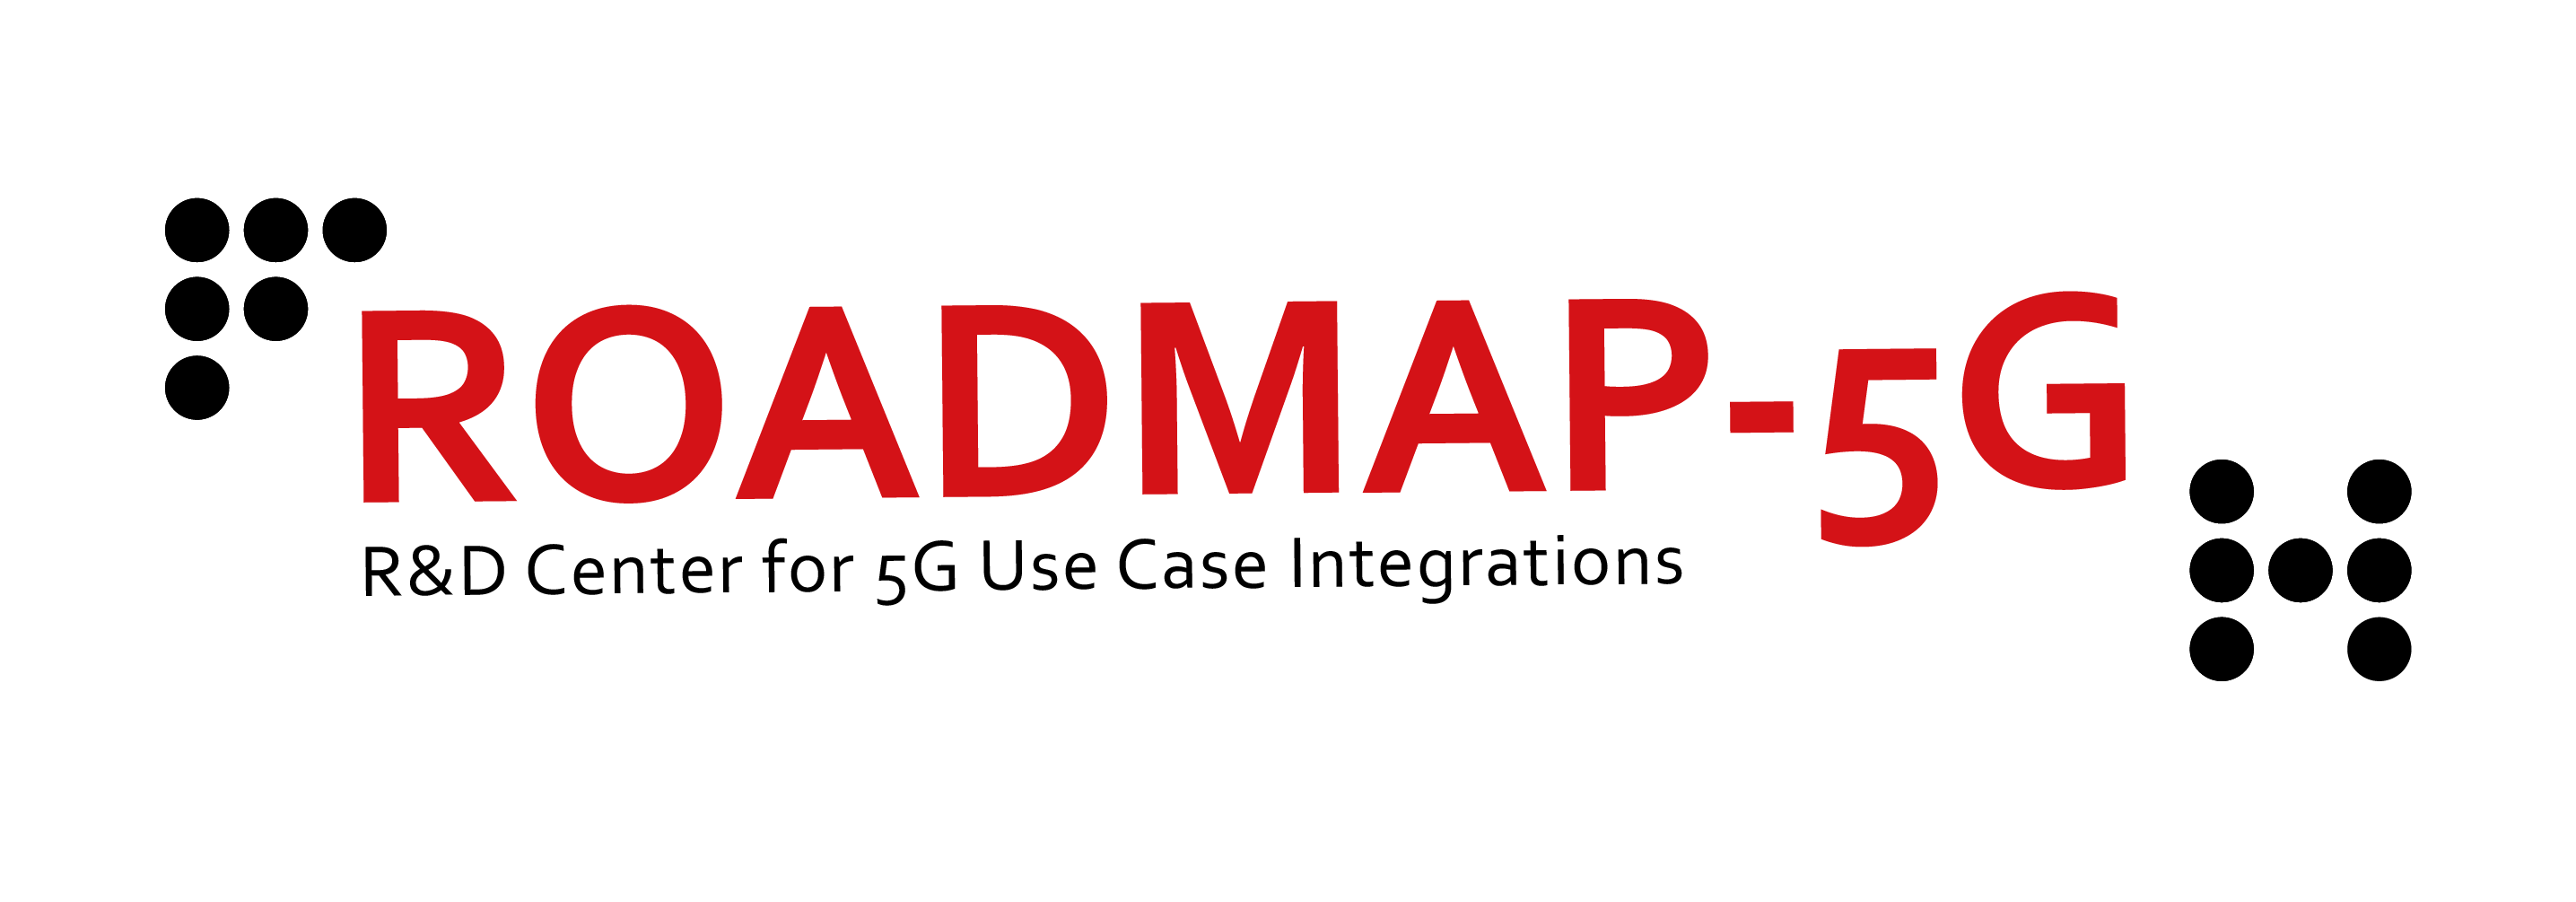 ROADMAP-5G